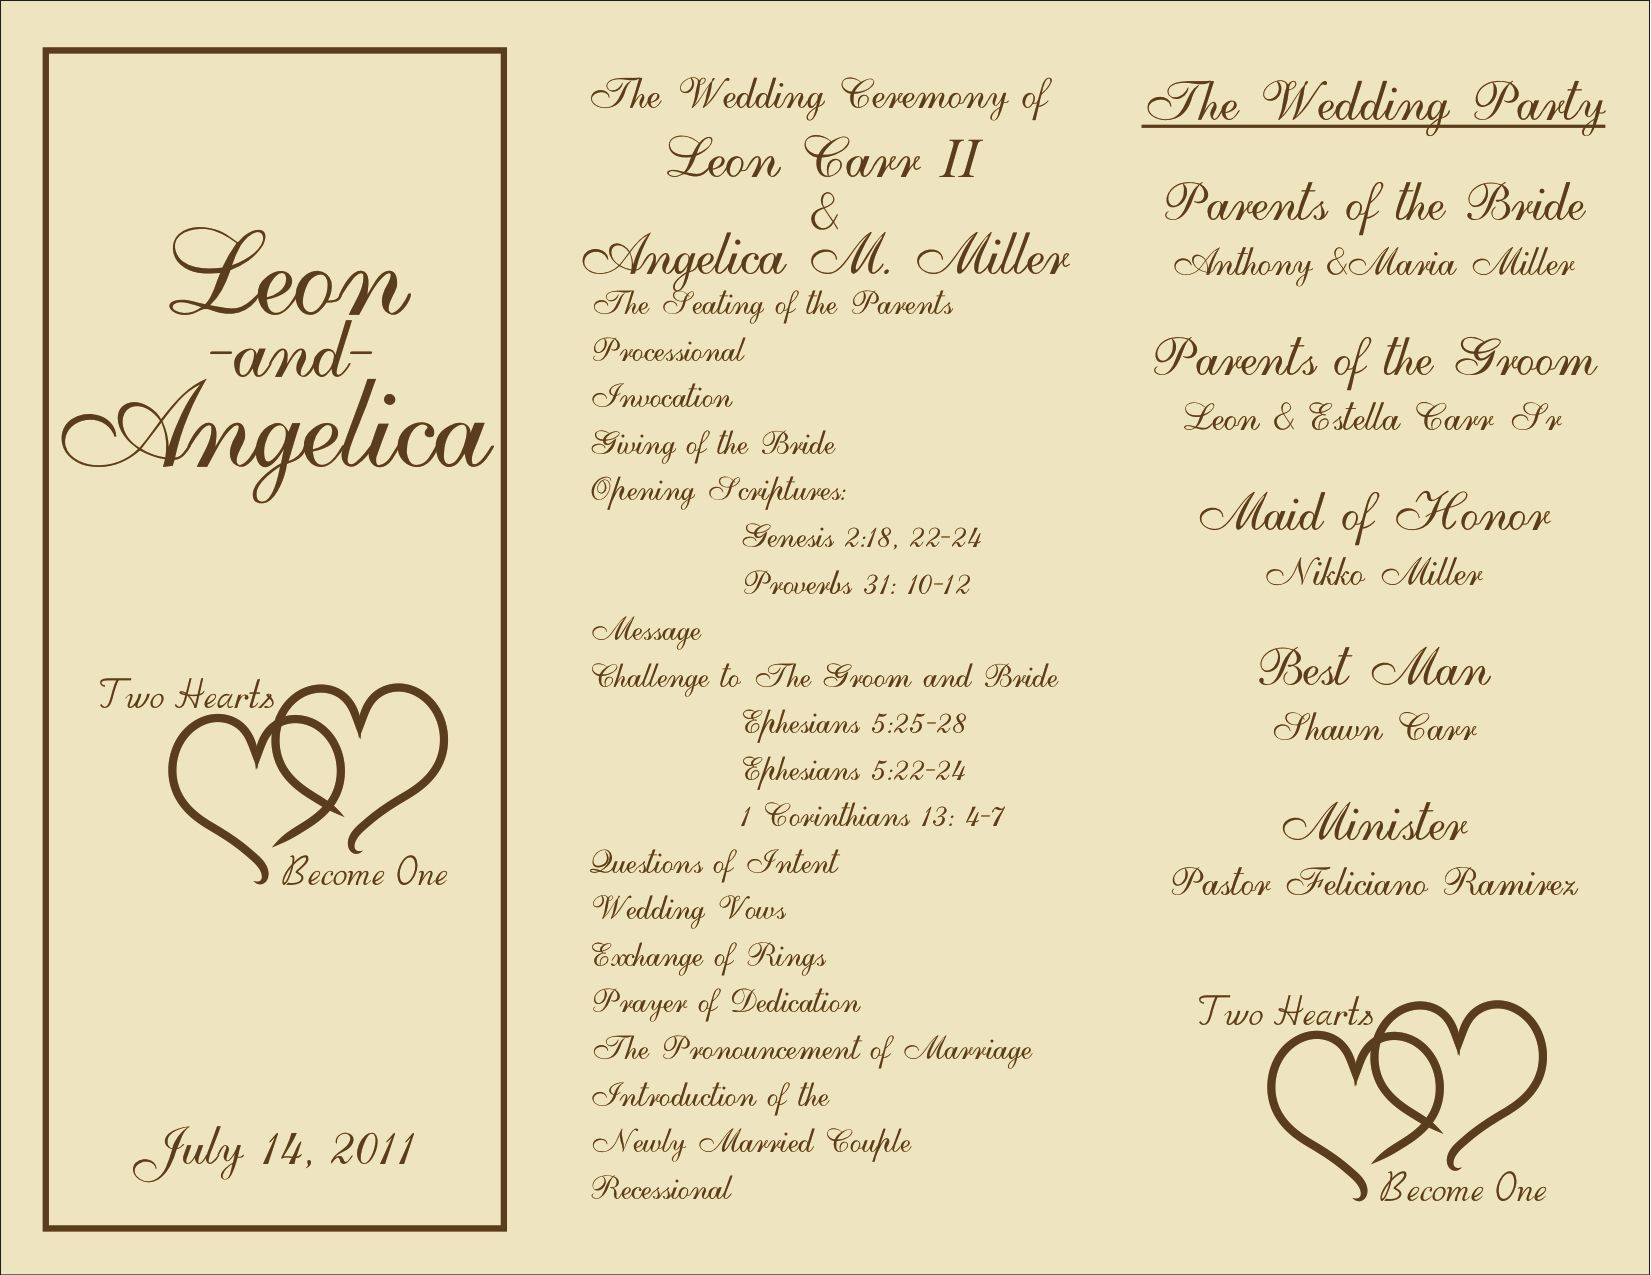 005 Unforgettable Wedding Program Template Free Download Inspiration  Downloadable Pdf Reception Microsoft Word FanFull